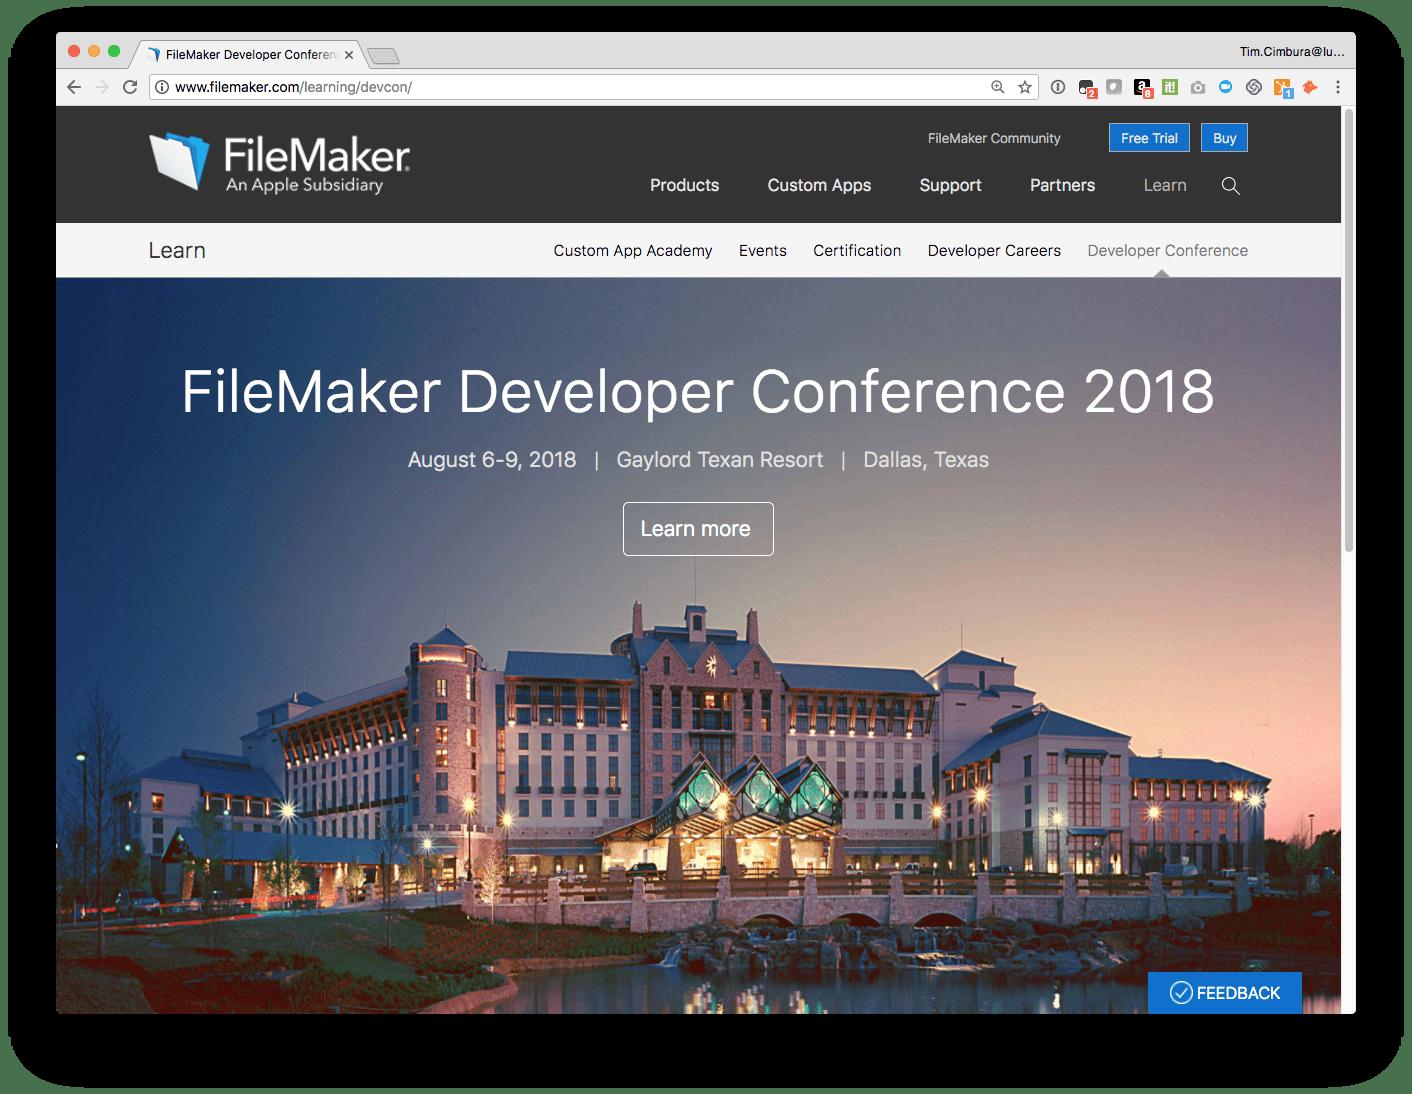 FileMaker DevCon (Developer Conference) 2018 2